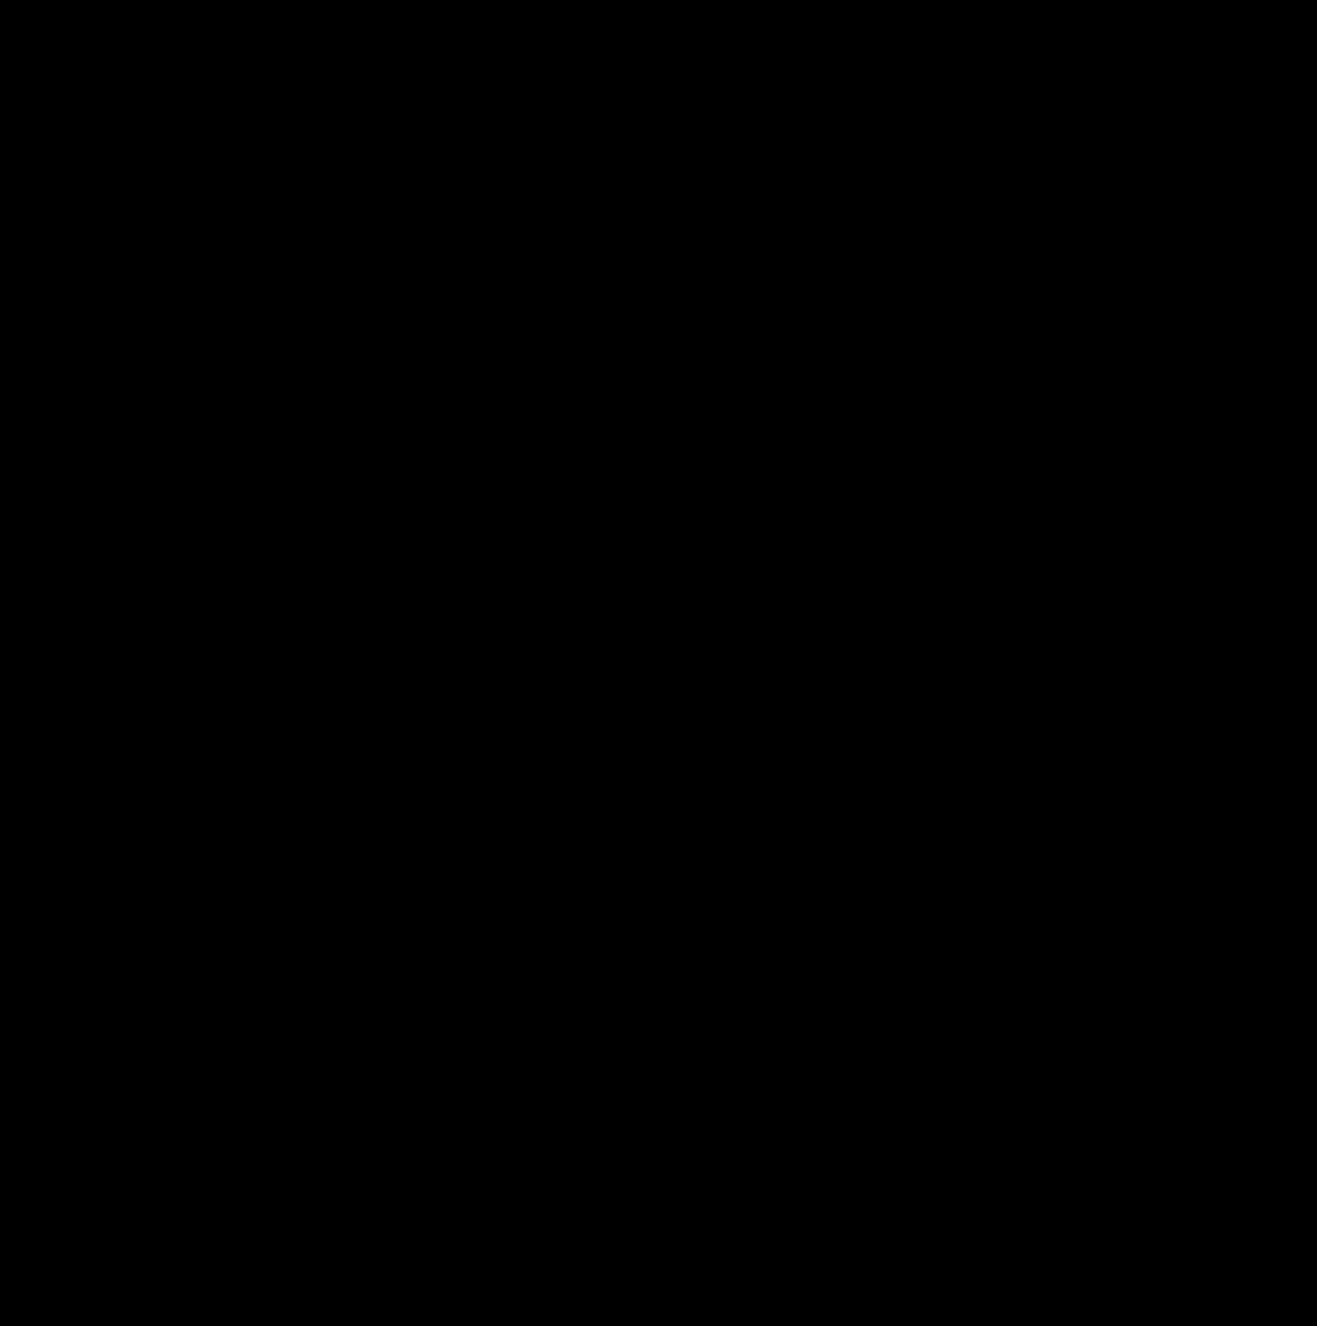 Andamooka Opal Solid Oval Cabochon 12x7mm